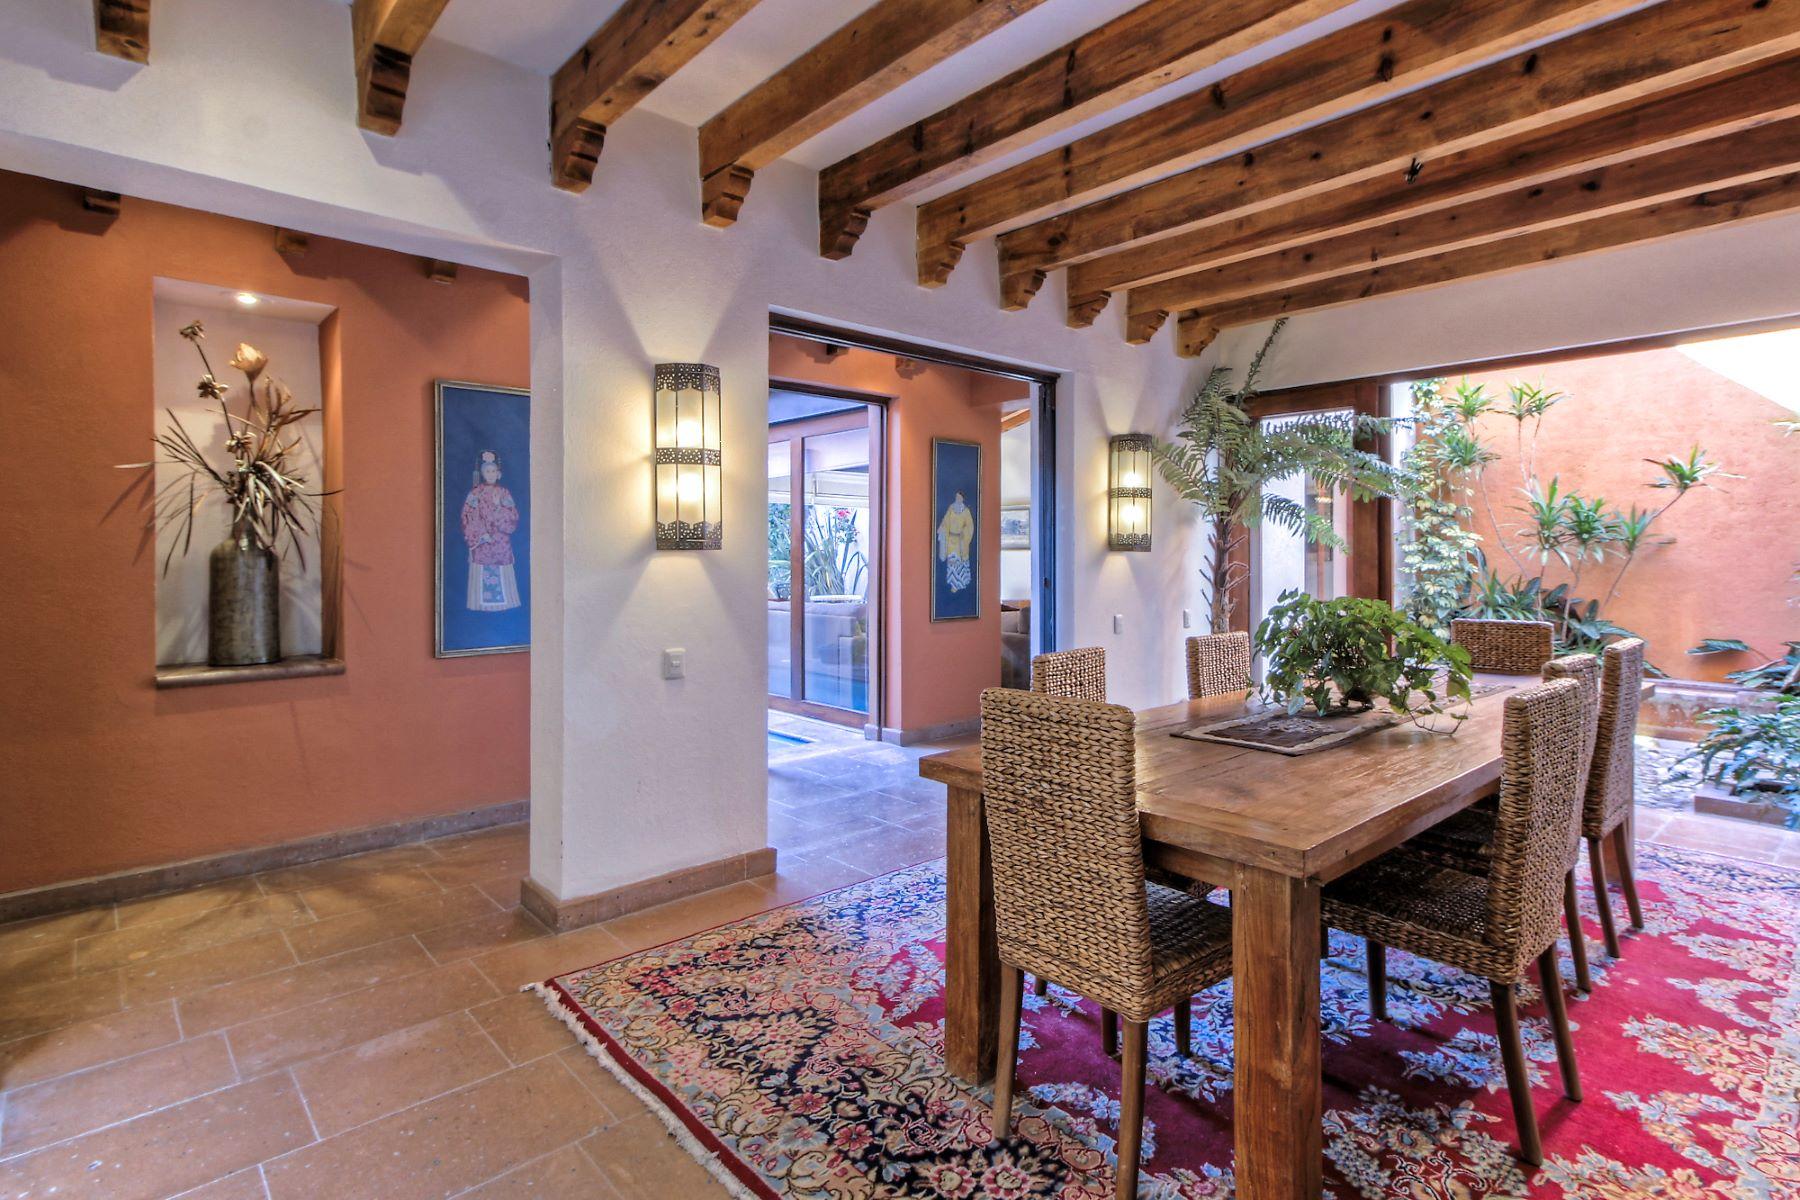 Additional photo for property listing at Quinta del Sol Hacienda de Santa Maria San Miguel De Allende, Guanajuato 37700 Mexico